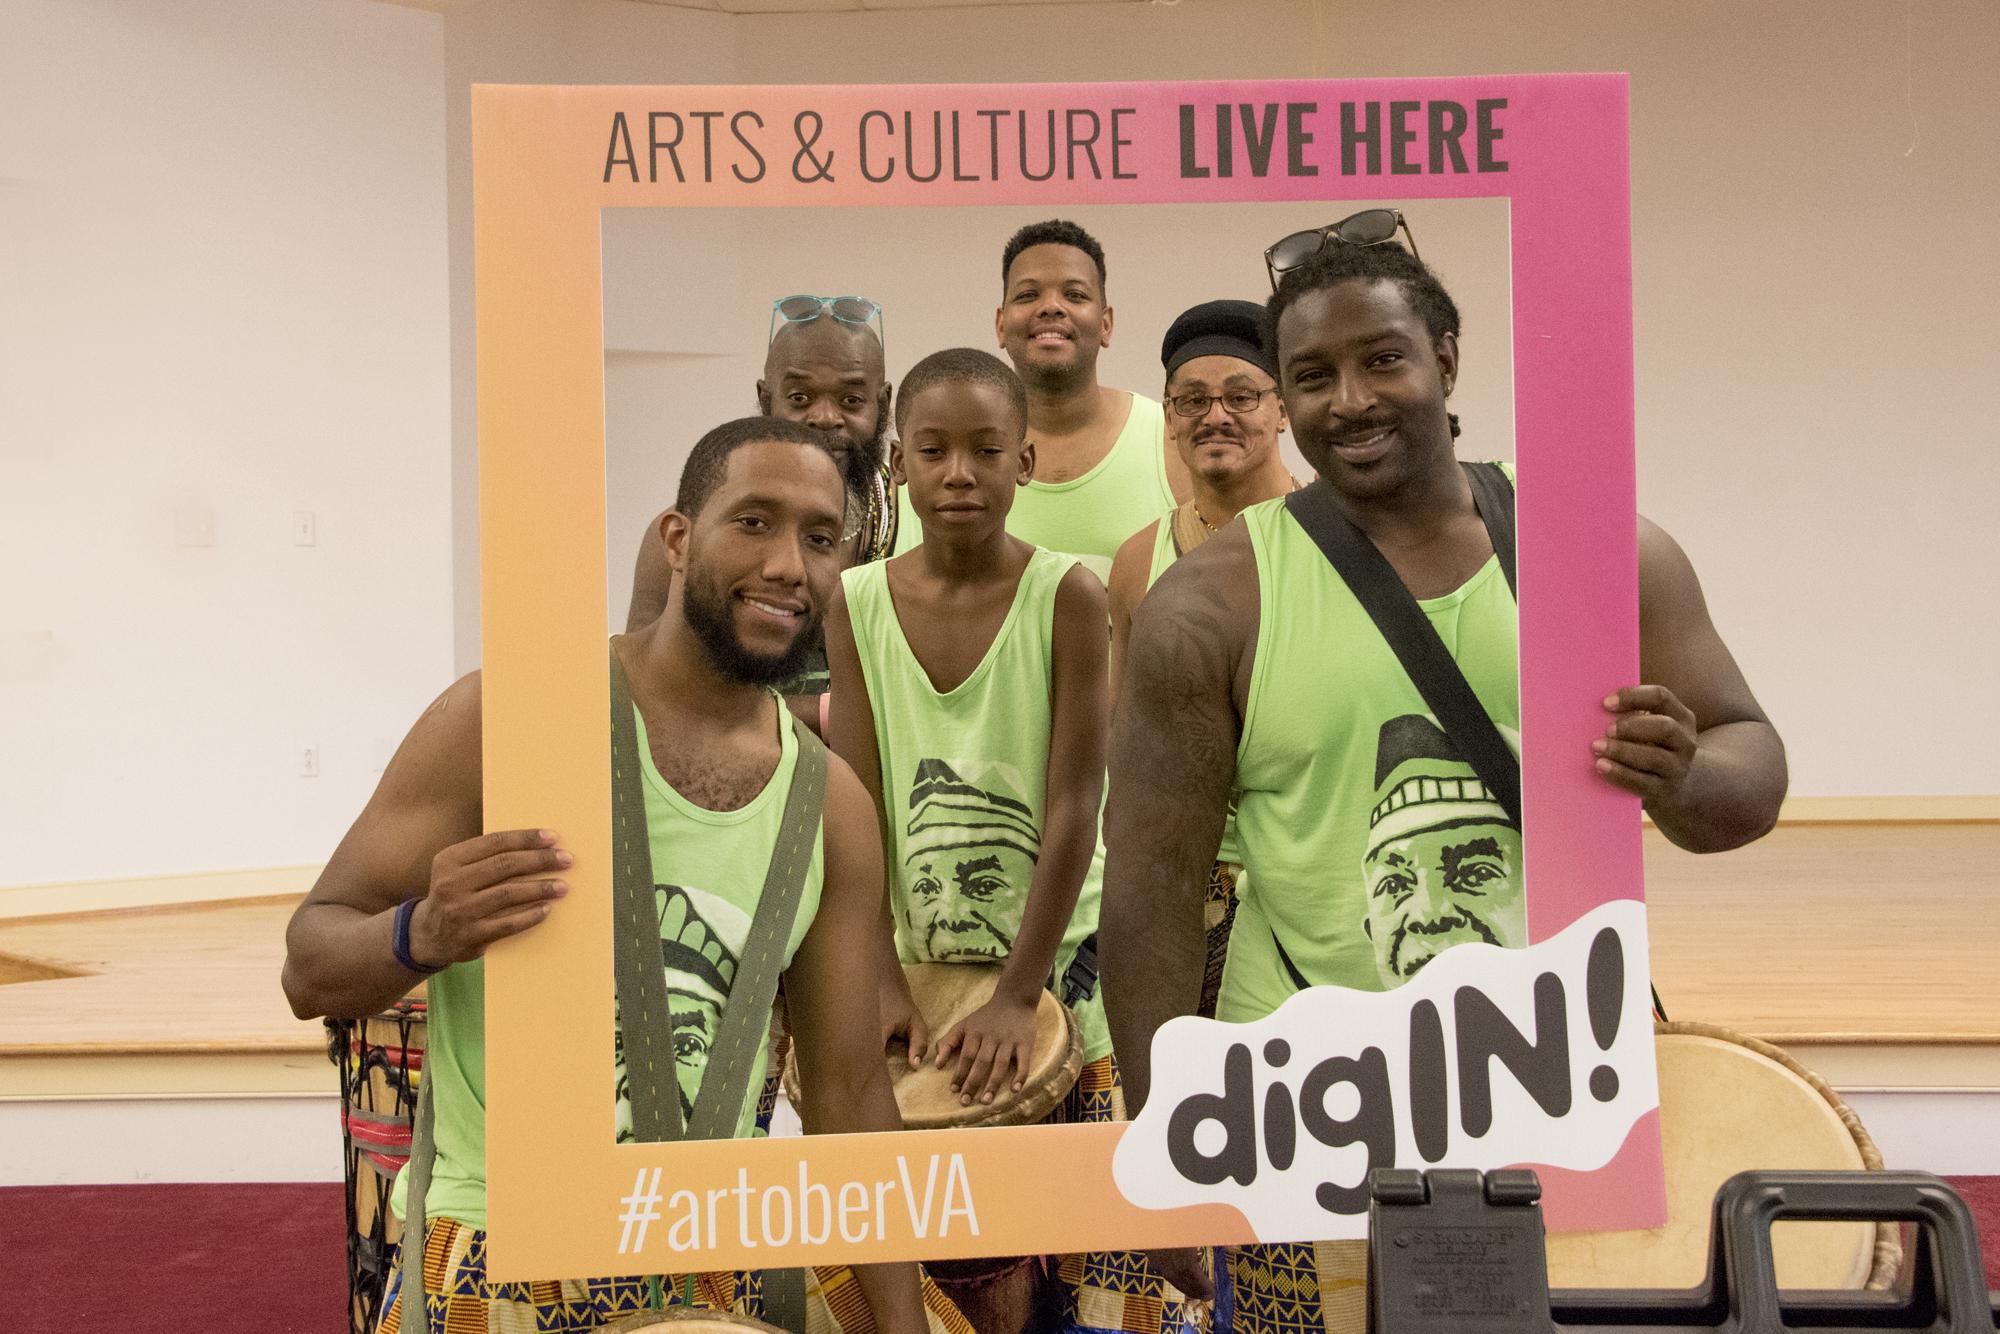 053 Ezibu African Dance Images [PC-Tom Topinka] 10-07-18.jpg